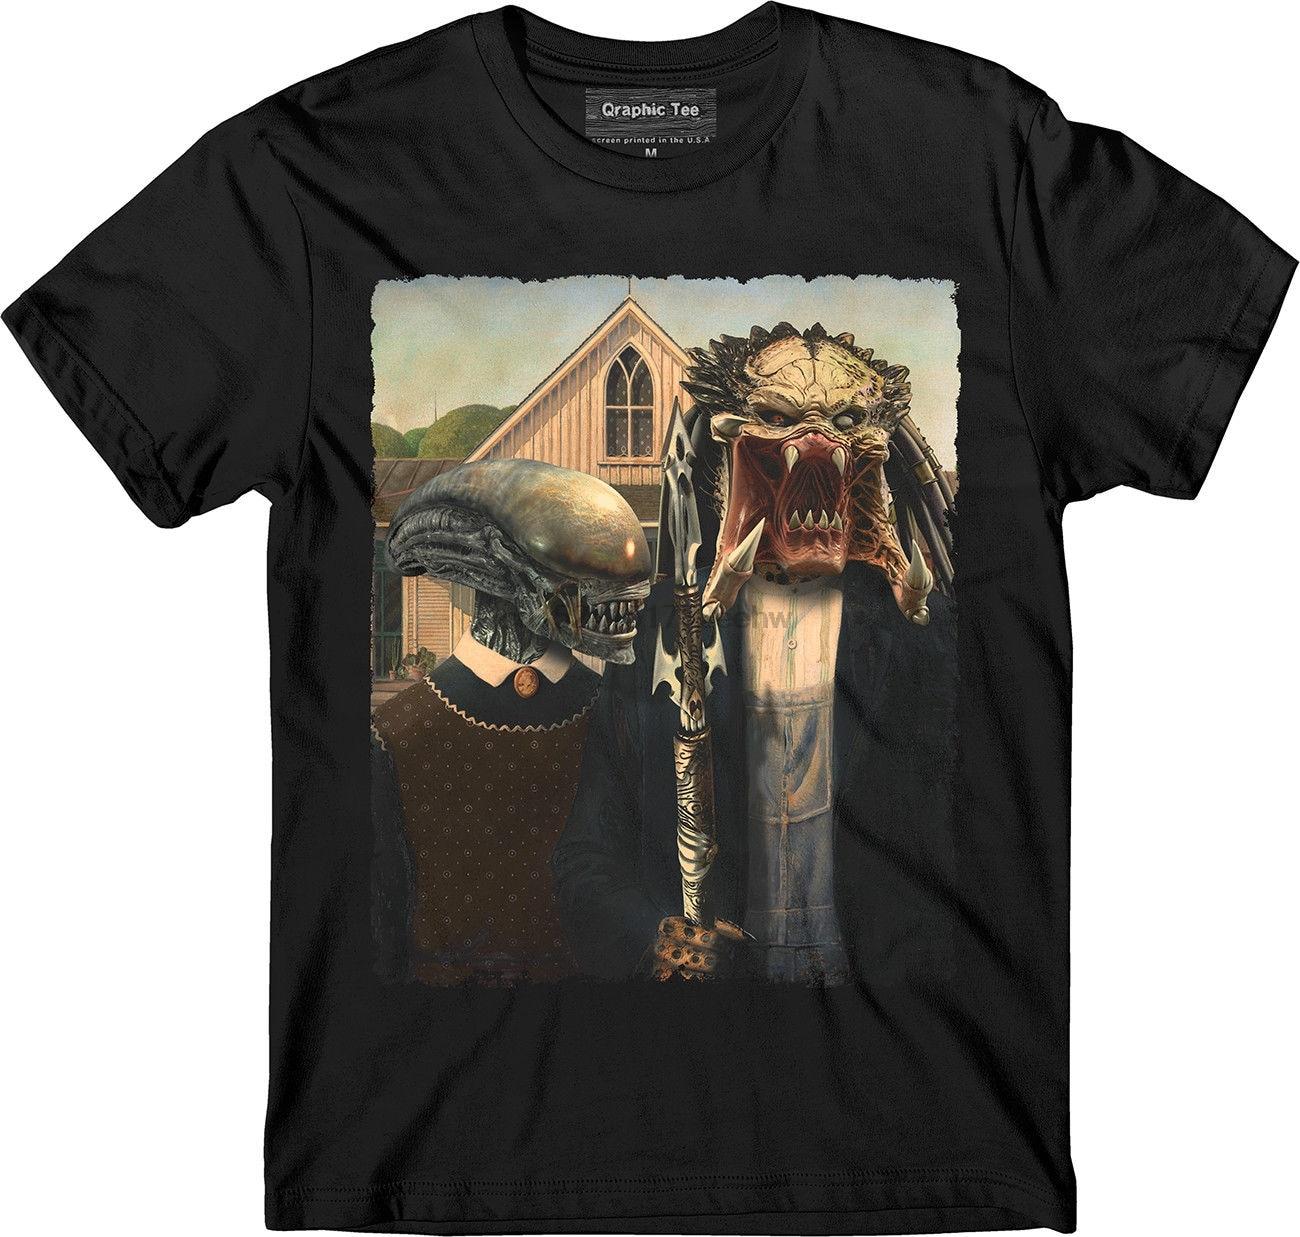 Gothic Decor Original Printed Short Sleeve Shirt Size XS-2XL Big,Roses and Skull